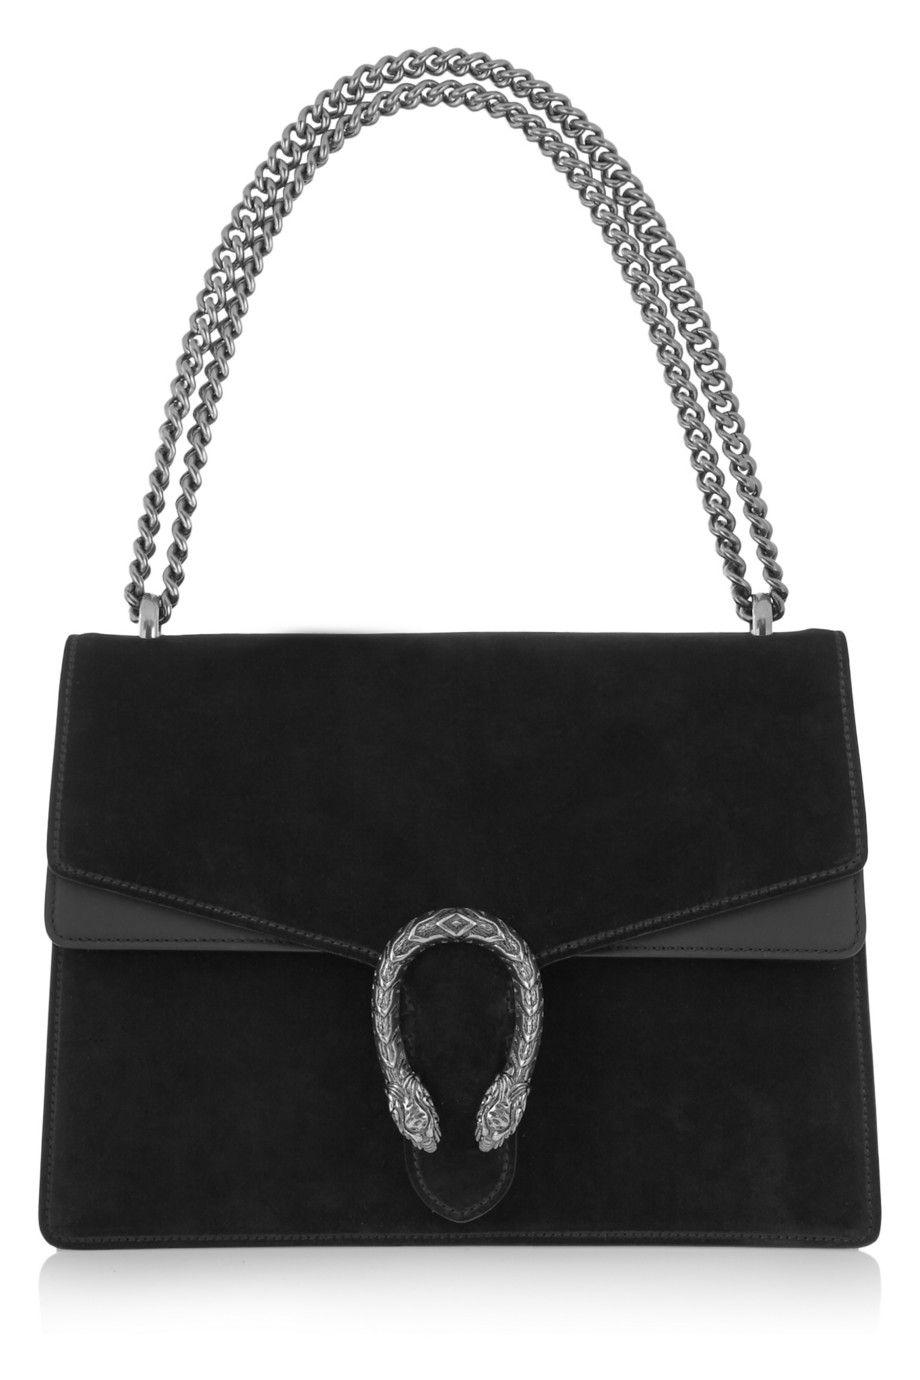 Gucci - Dionysus medium suede and leather shoulder bag